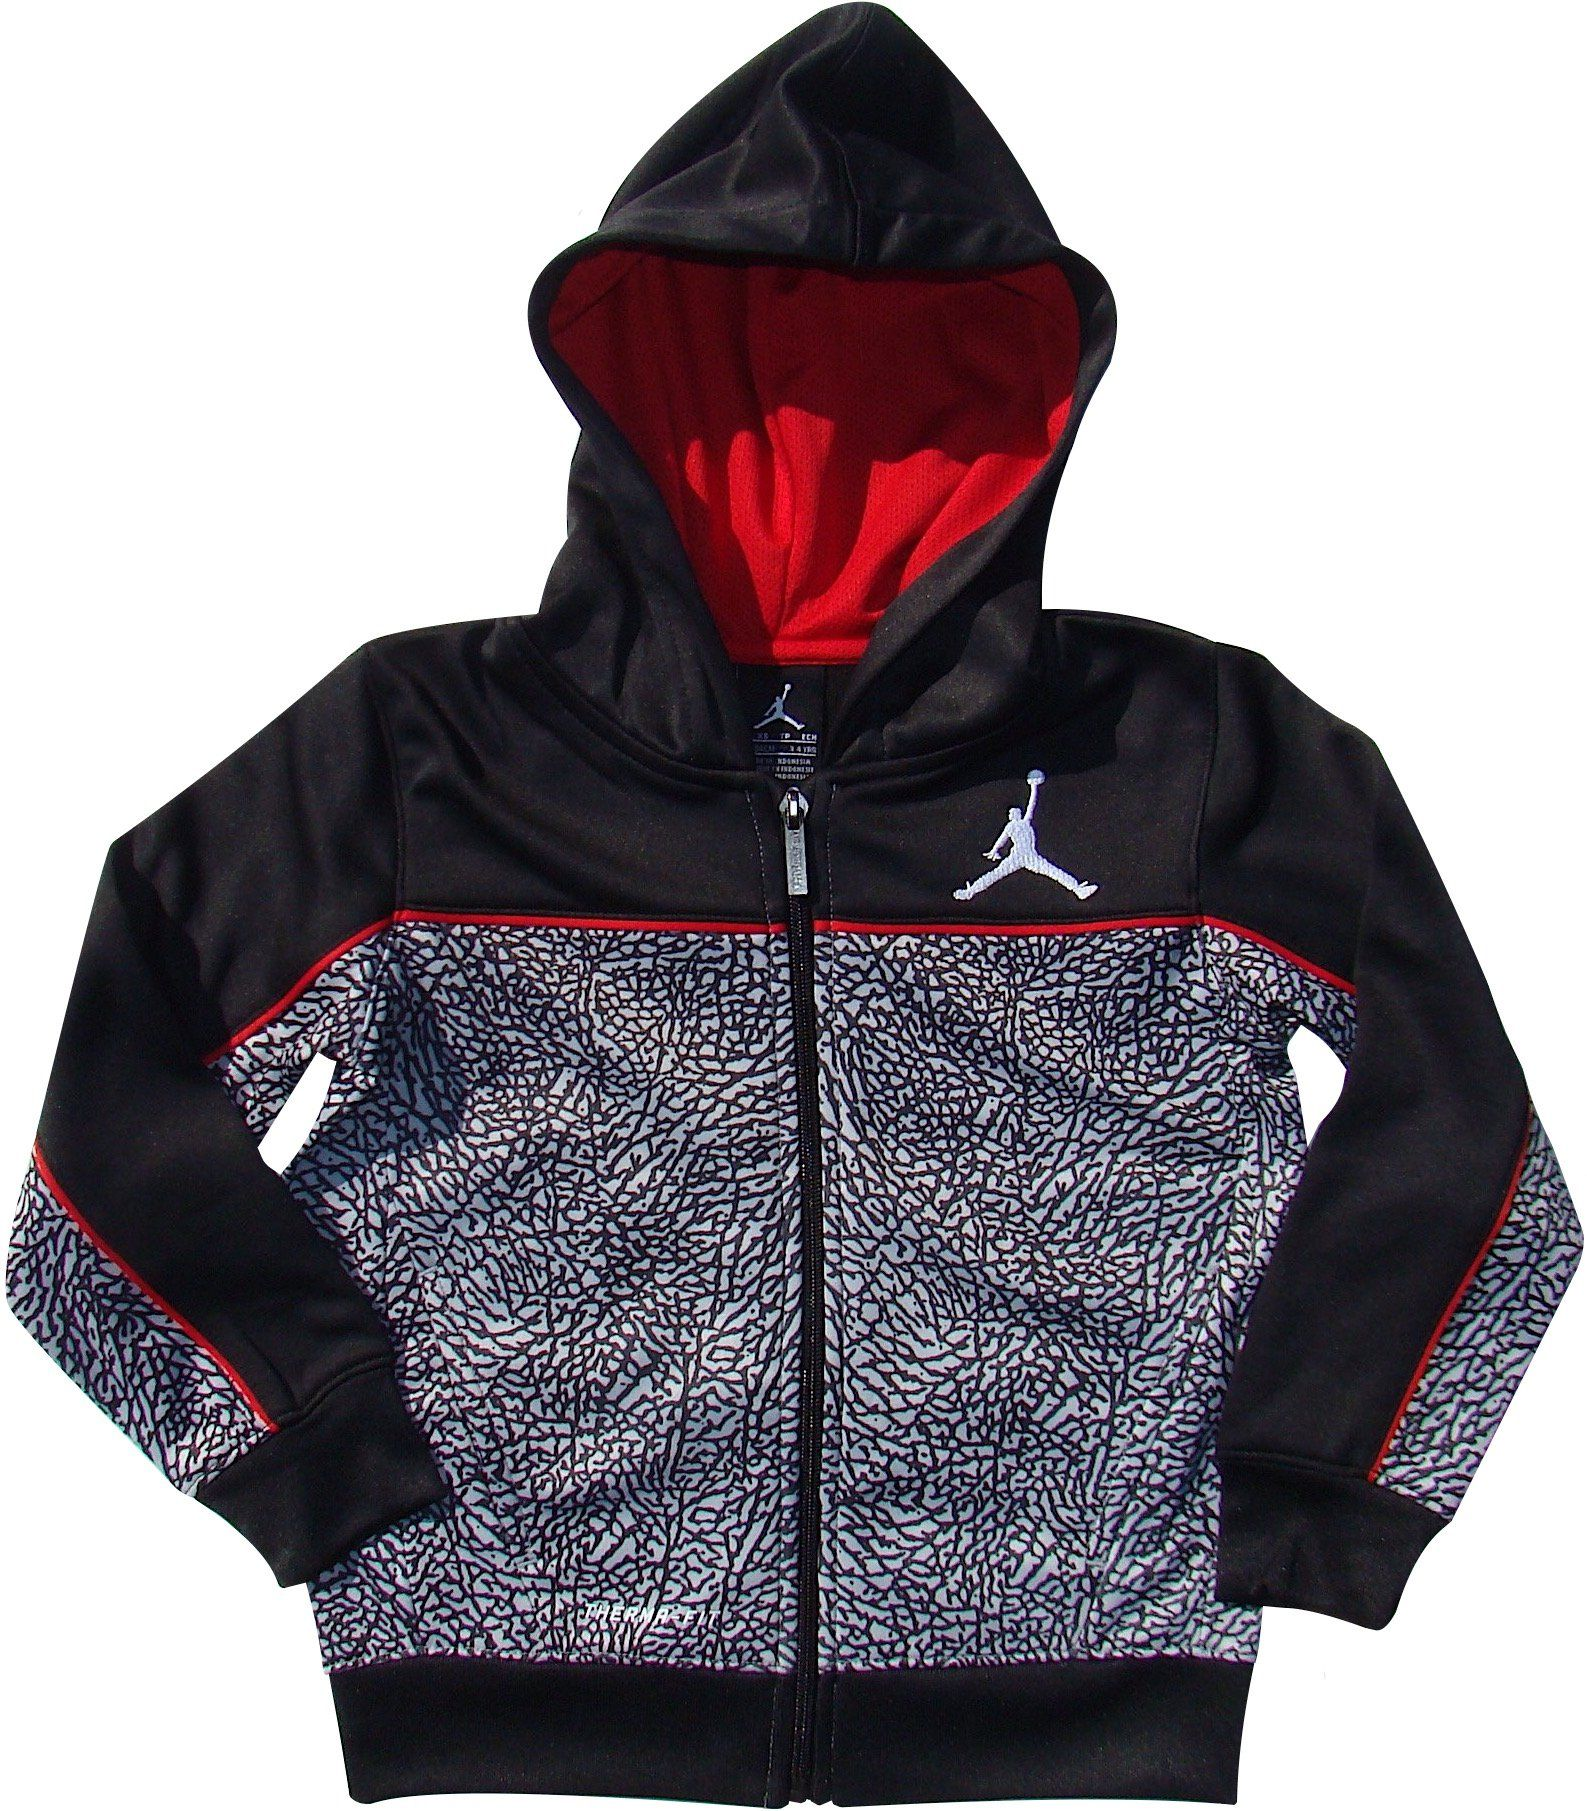 96db19b90a0ef1 Nike Boys Jordan Therma-Fit Elephant Print Hooded Jacket (5). Nike Jordan